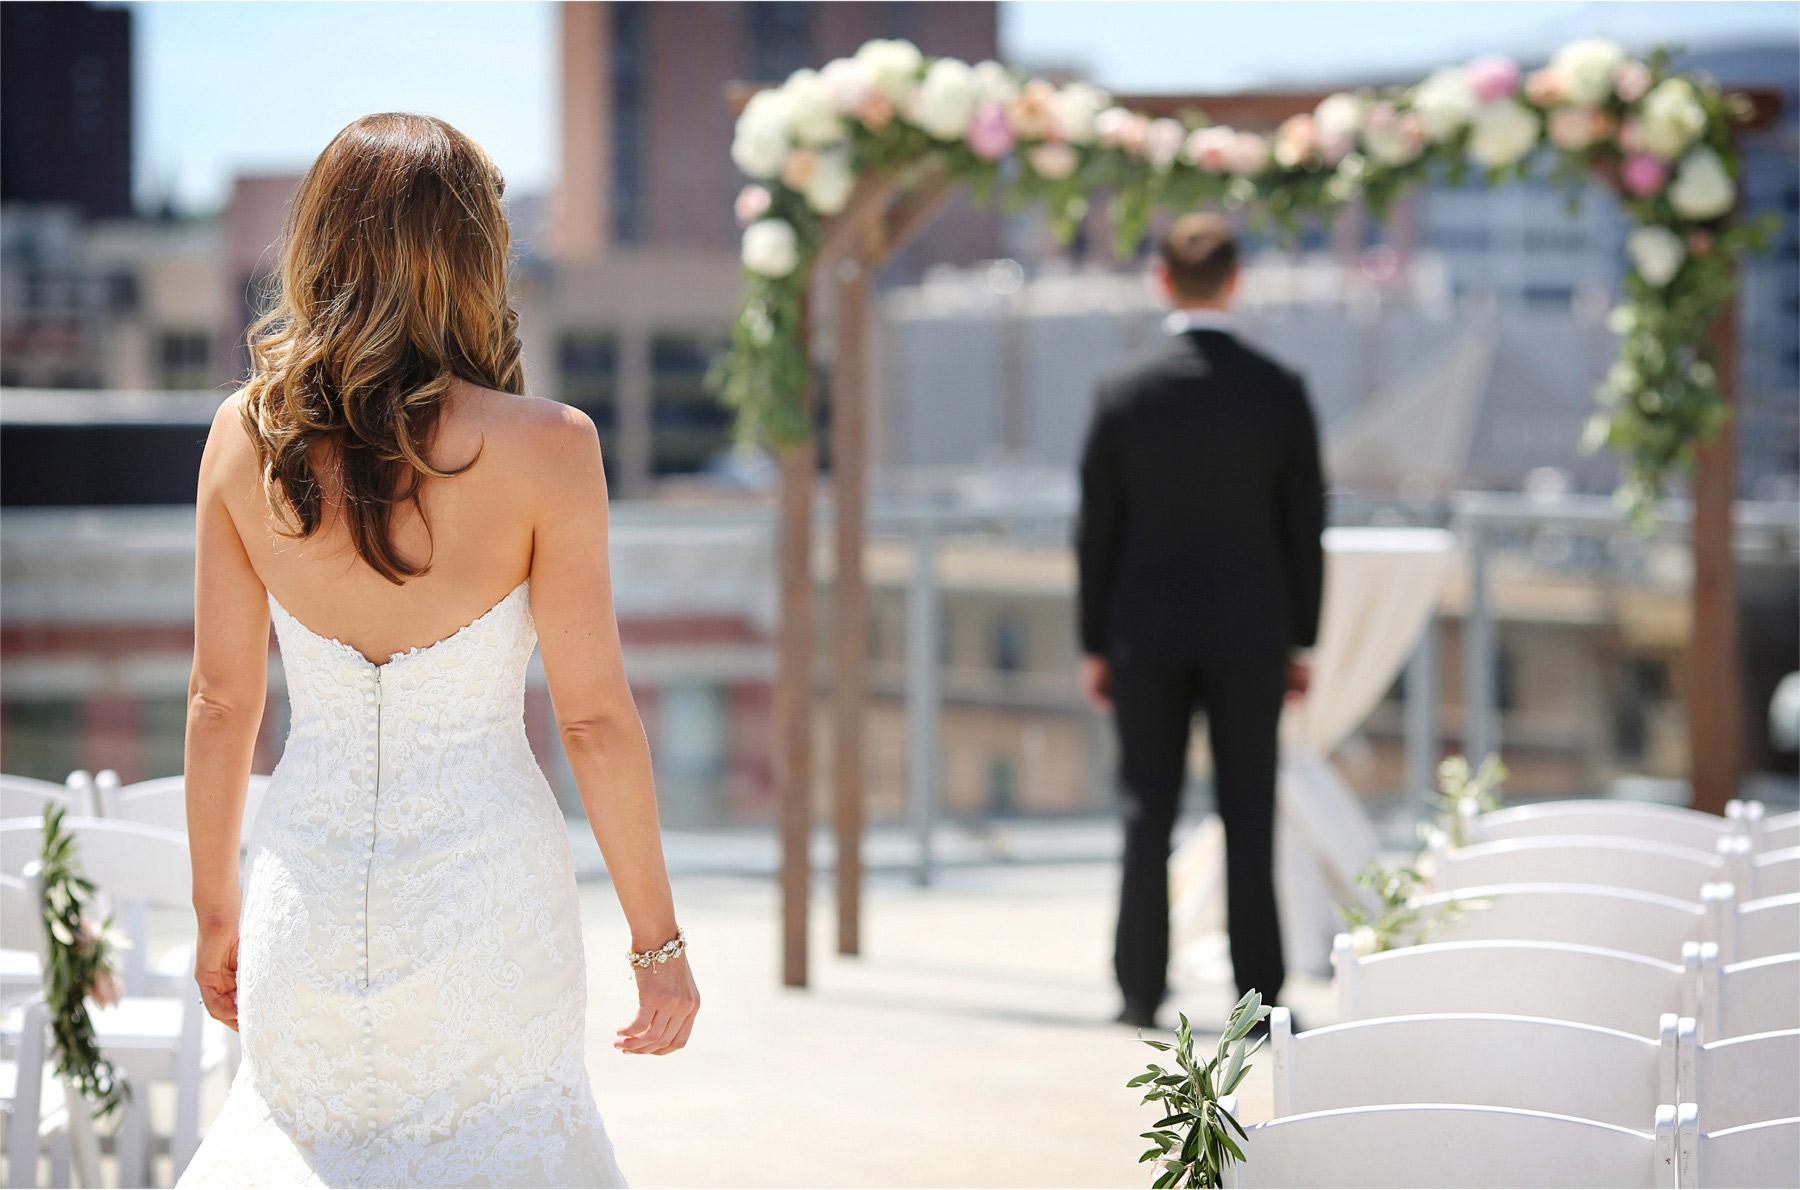 06-Saint-Paul-Minnesota-Wedding-Photographer-by-Andrew-Vick-Photography-Summer-Abulae-First-Meeting-Bride-Groom-Molly-and-Dan.jpg